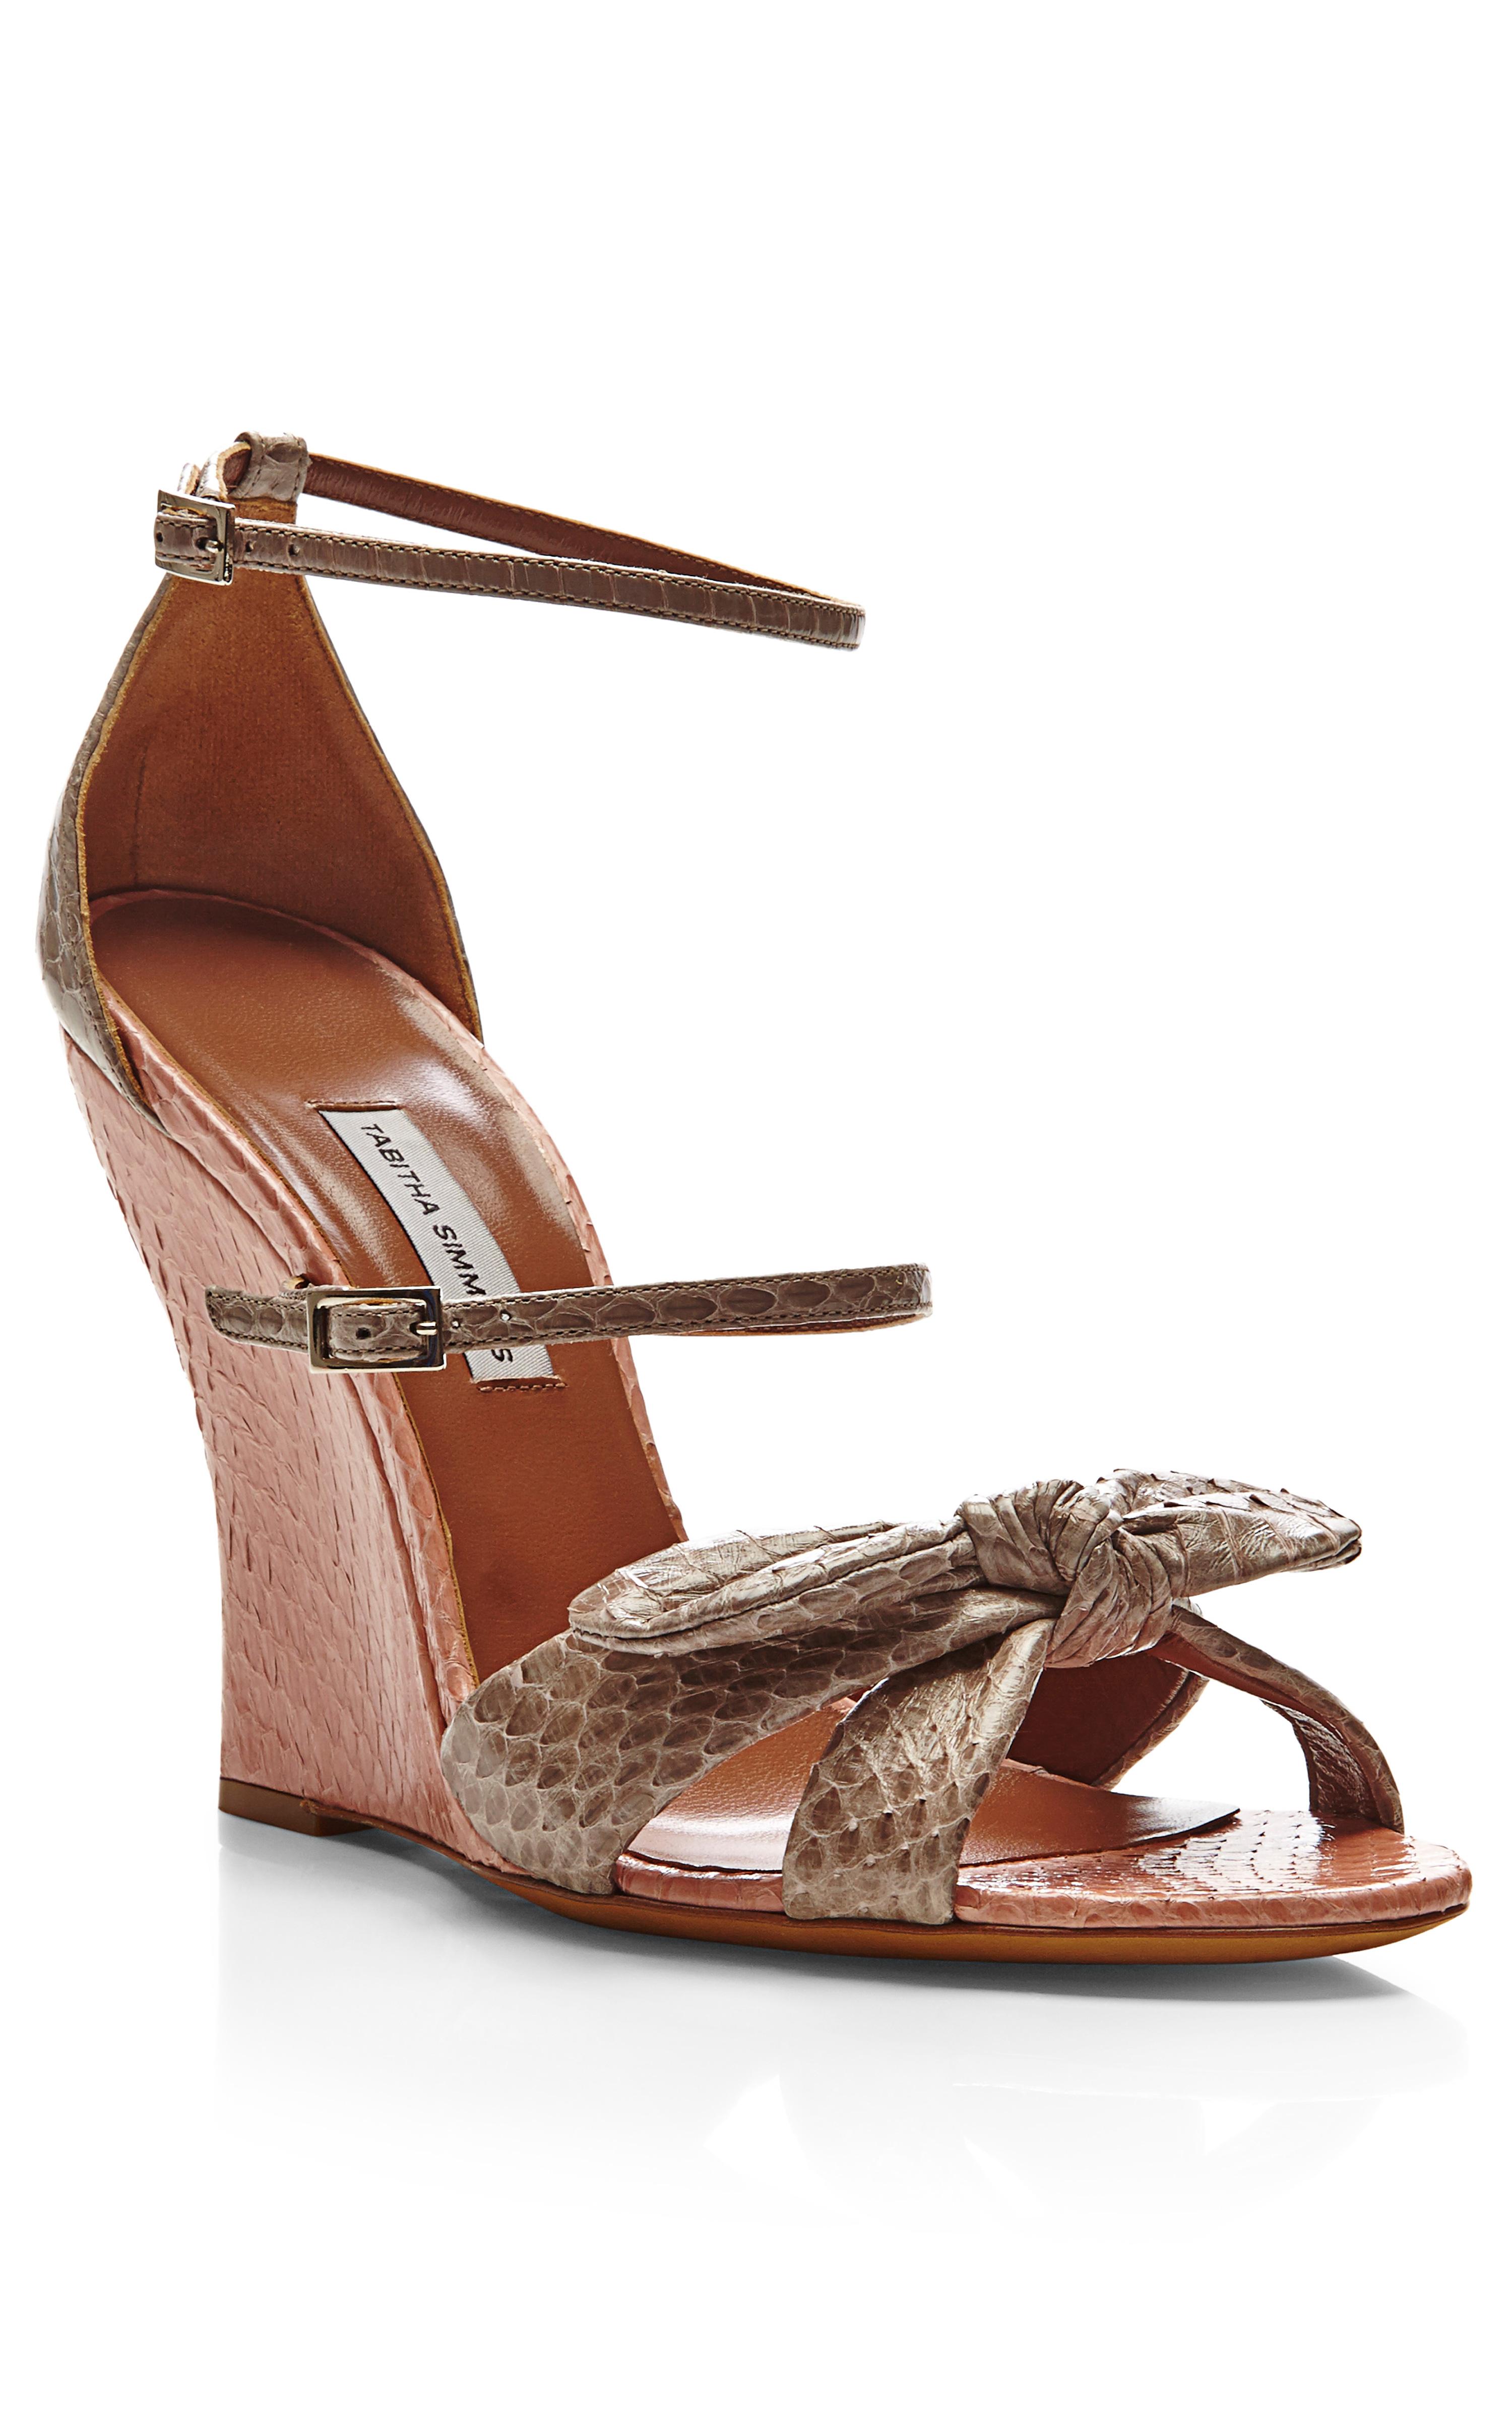 simmons clara snakeskin wedge sandals in lyst